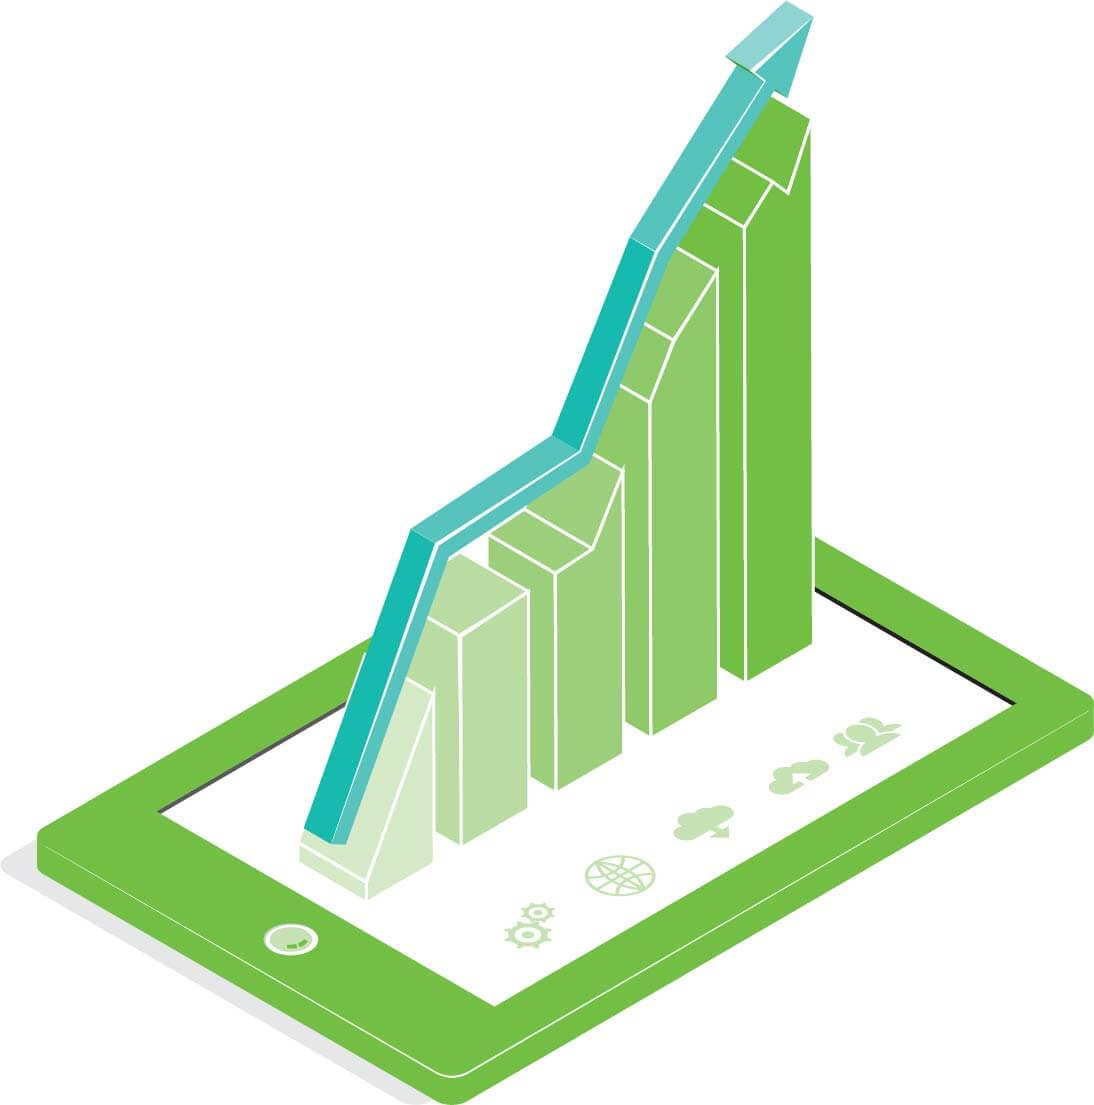 capital planning modeling